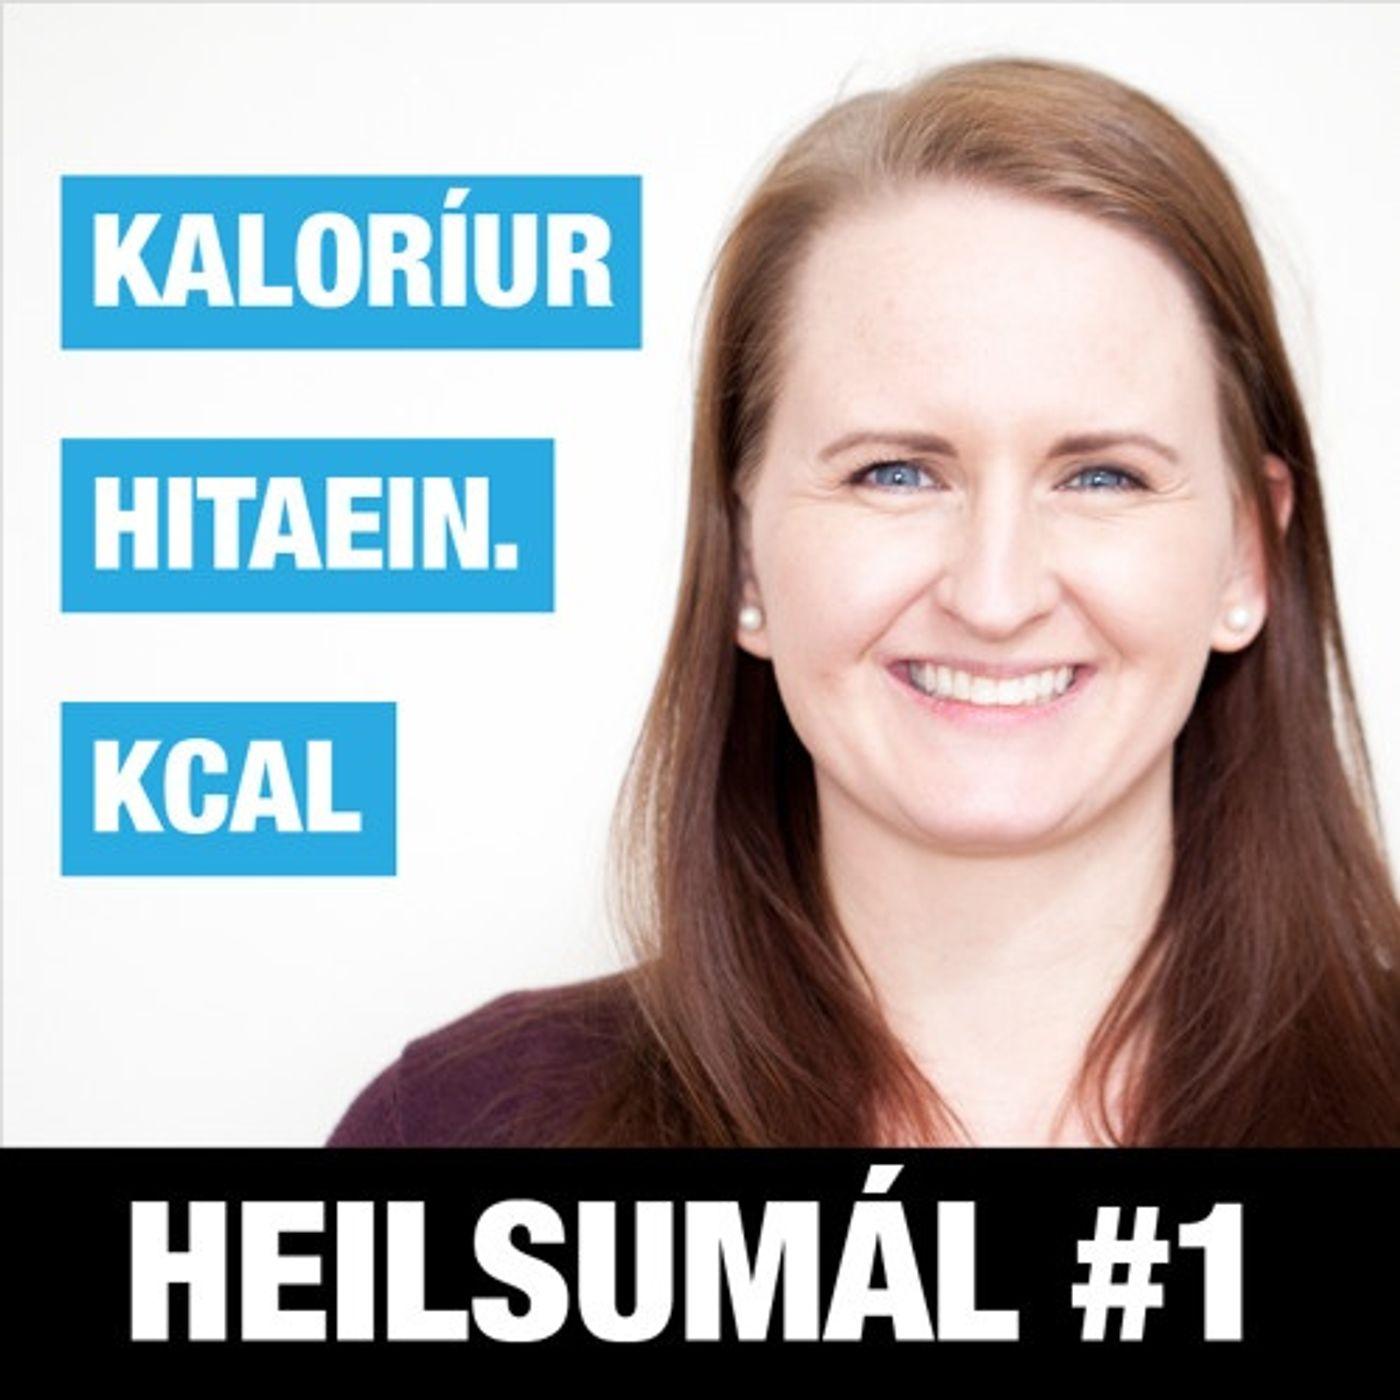 Heilsumal 01 - Kaloriur